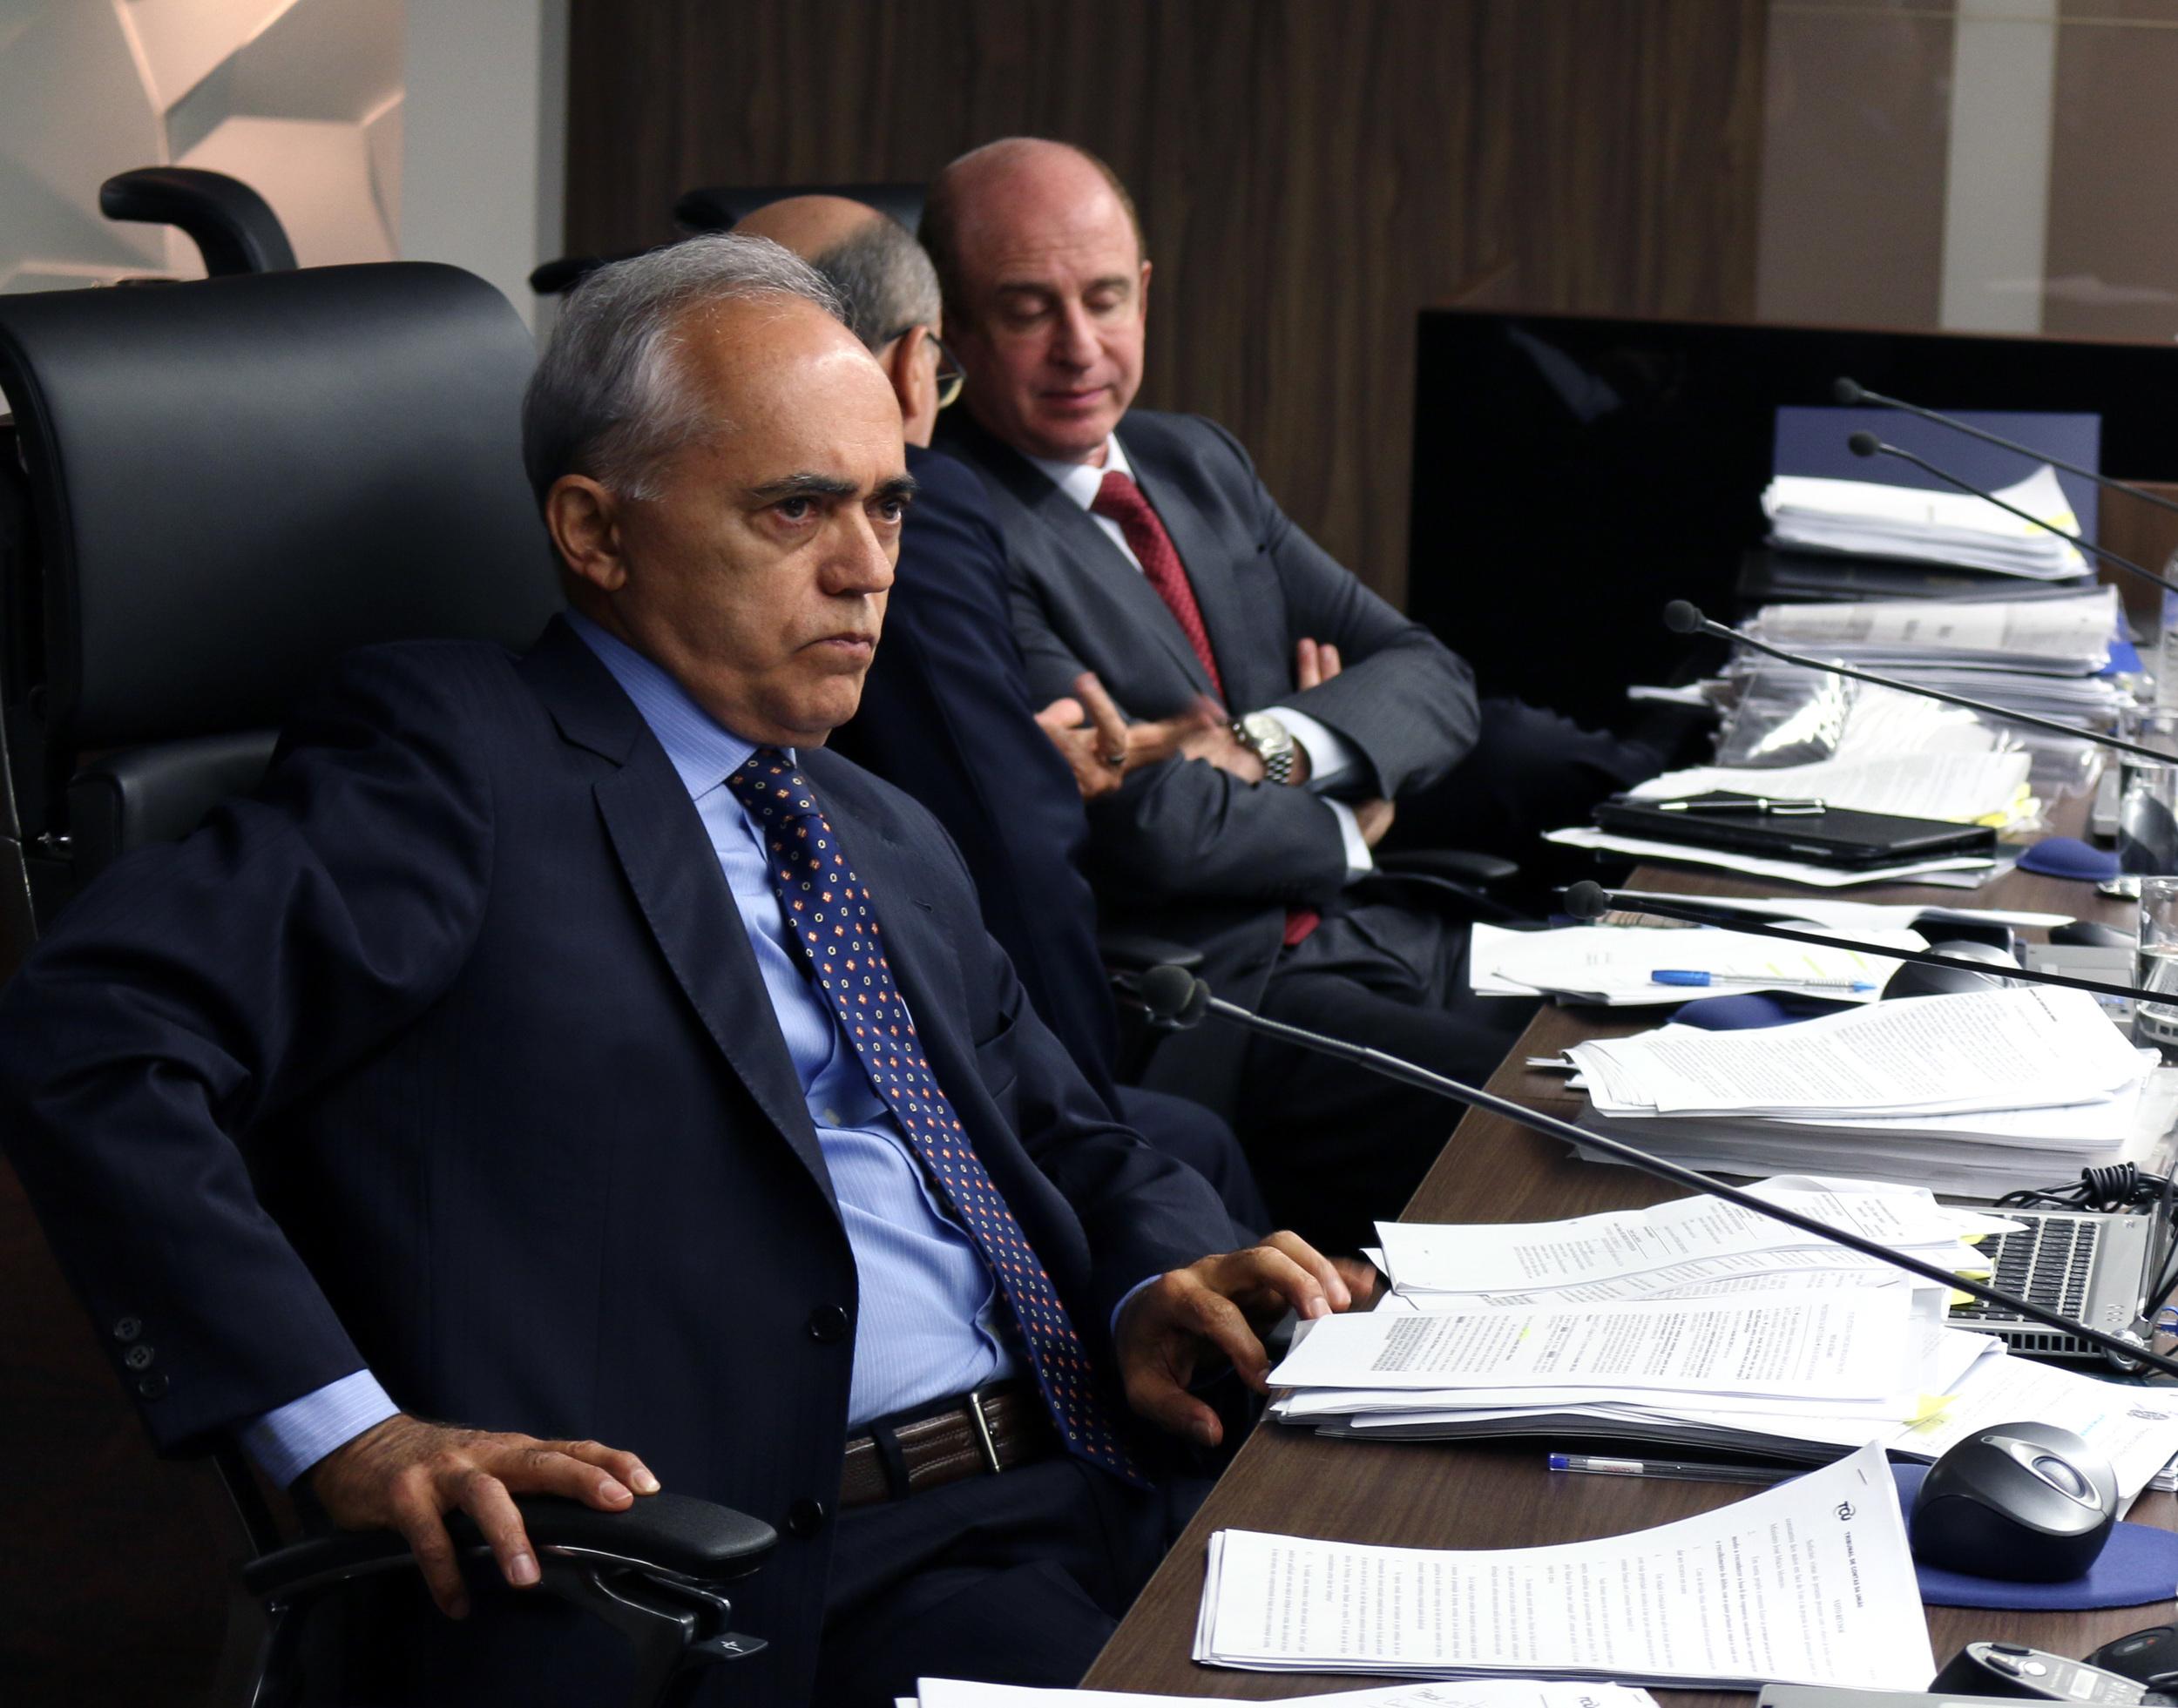 Ministro relator Raimundo Carreiro. Foto: Filipe Calmon / ANESP